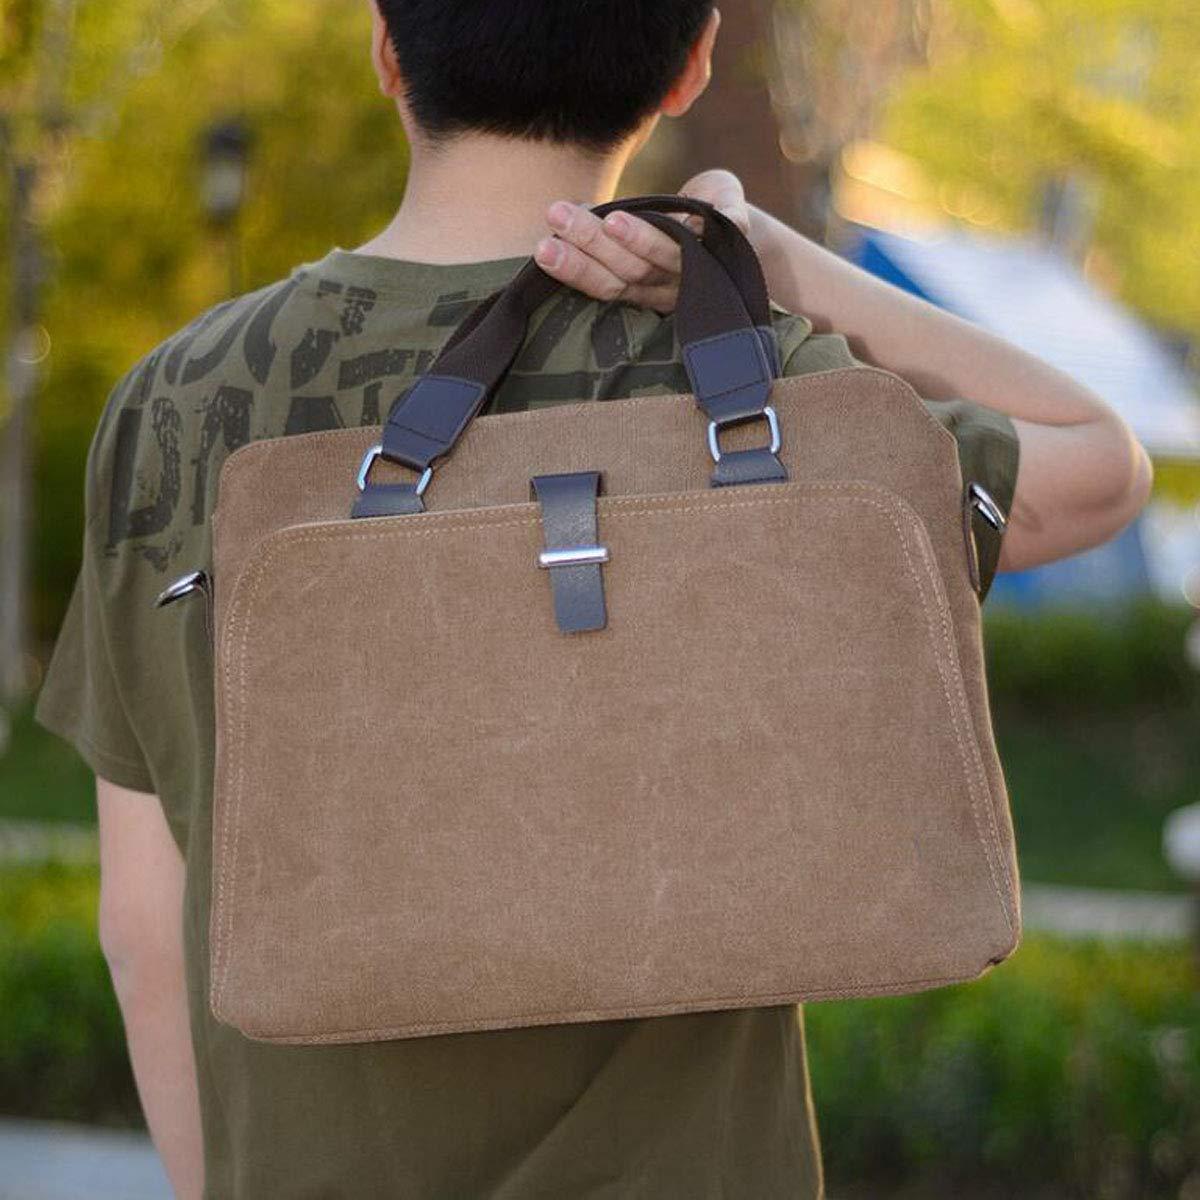 Suitable for Travel Aishanghuayi Briefcase Etc Color : Coffee Color 2018 New Canvas Mens Messenger Bag Shoulder Bag Business Bag Work Black Size: 38931cm Durable